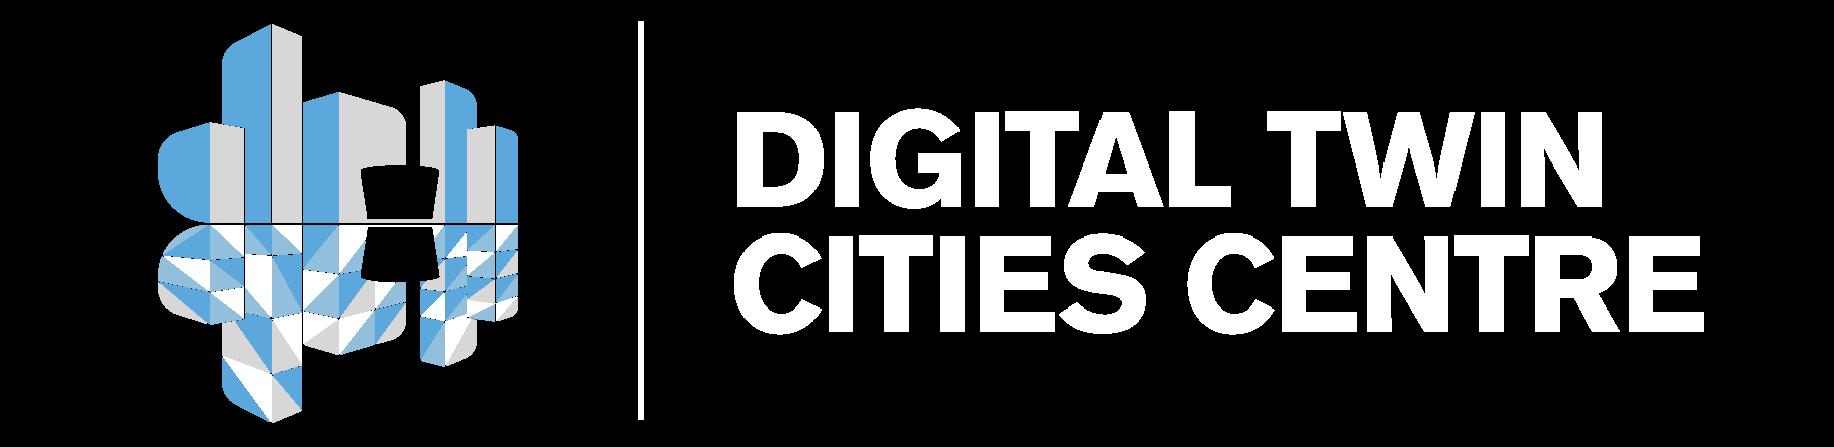 Digital Twin Cities Centre